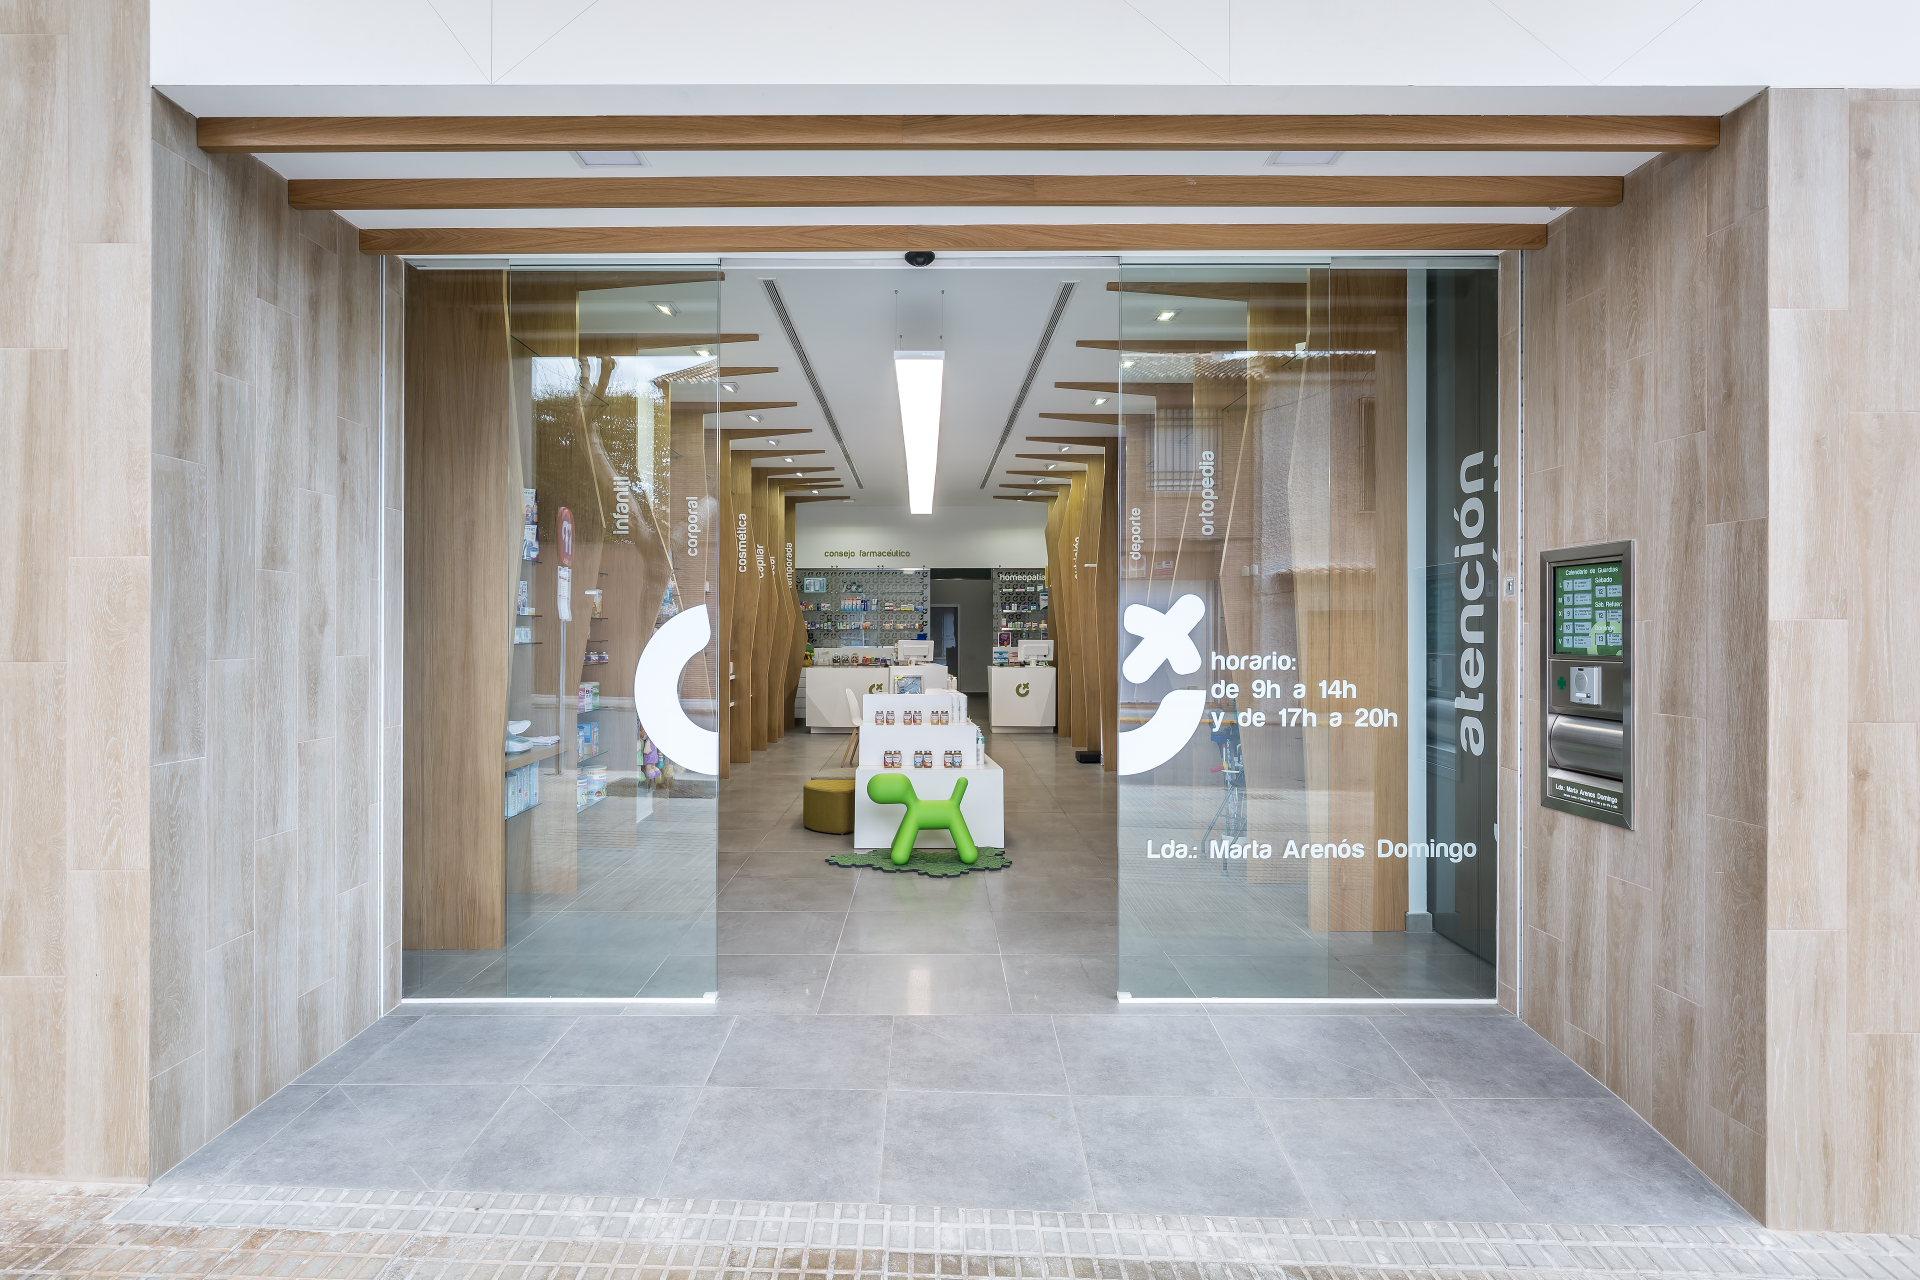 fotografia-arquitectura-valencia-german-cabo-d'estudio-farmacia-arenos-almassora-castellon (3)